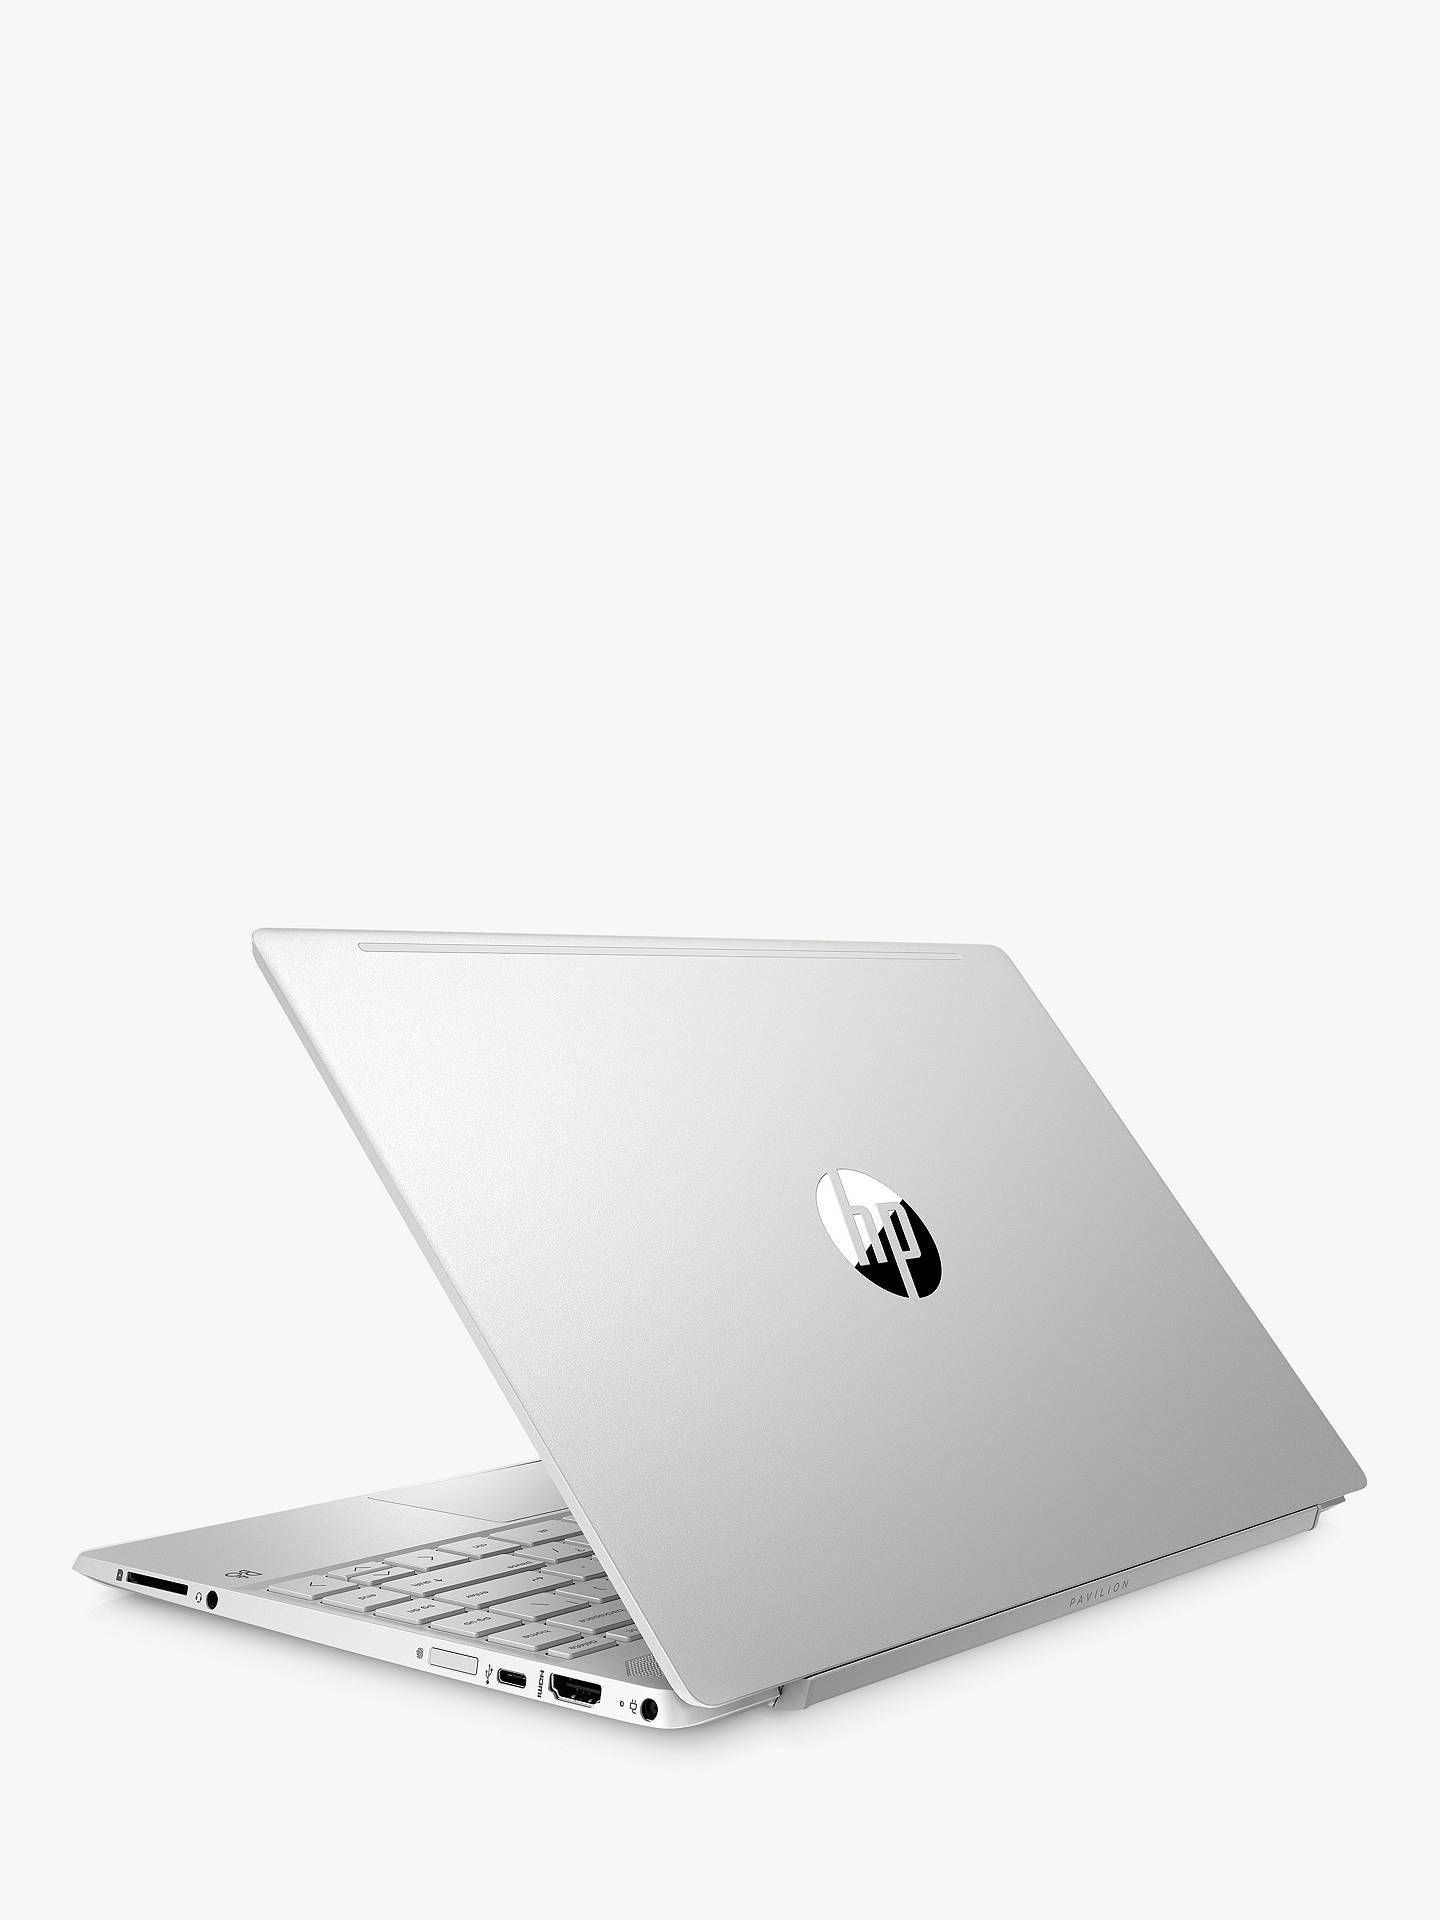 Hp Pavilion 13 An1007na Laptop Intel Core I7 8gb Ram 512gb Ssd 13 3 Full Hd Mineral Silver At John Lewis Partners